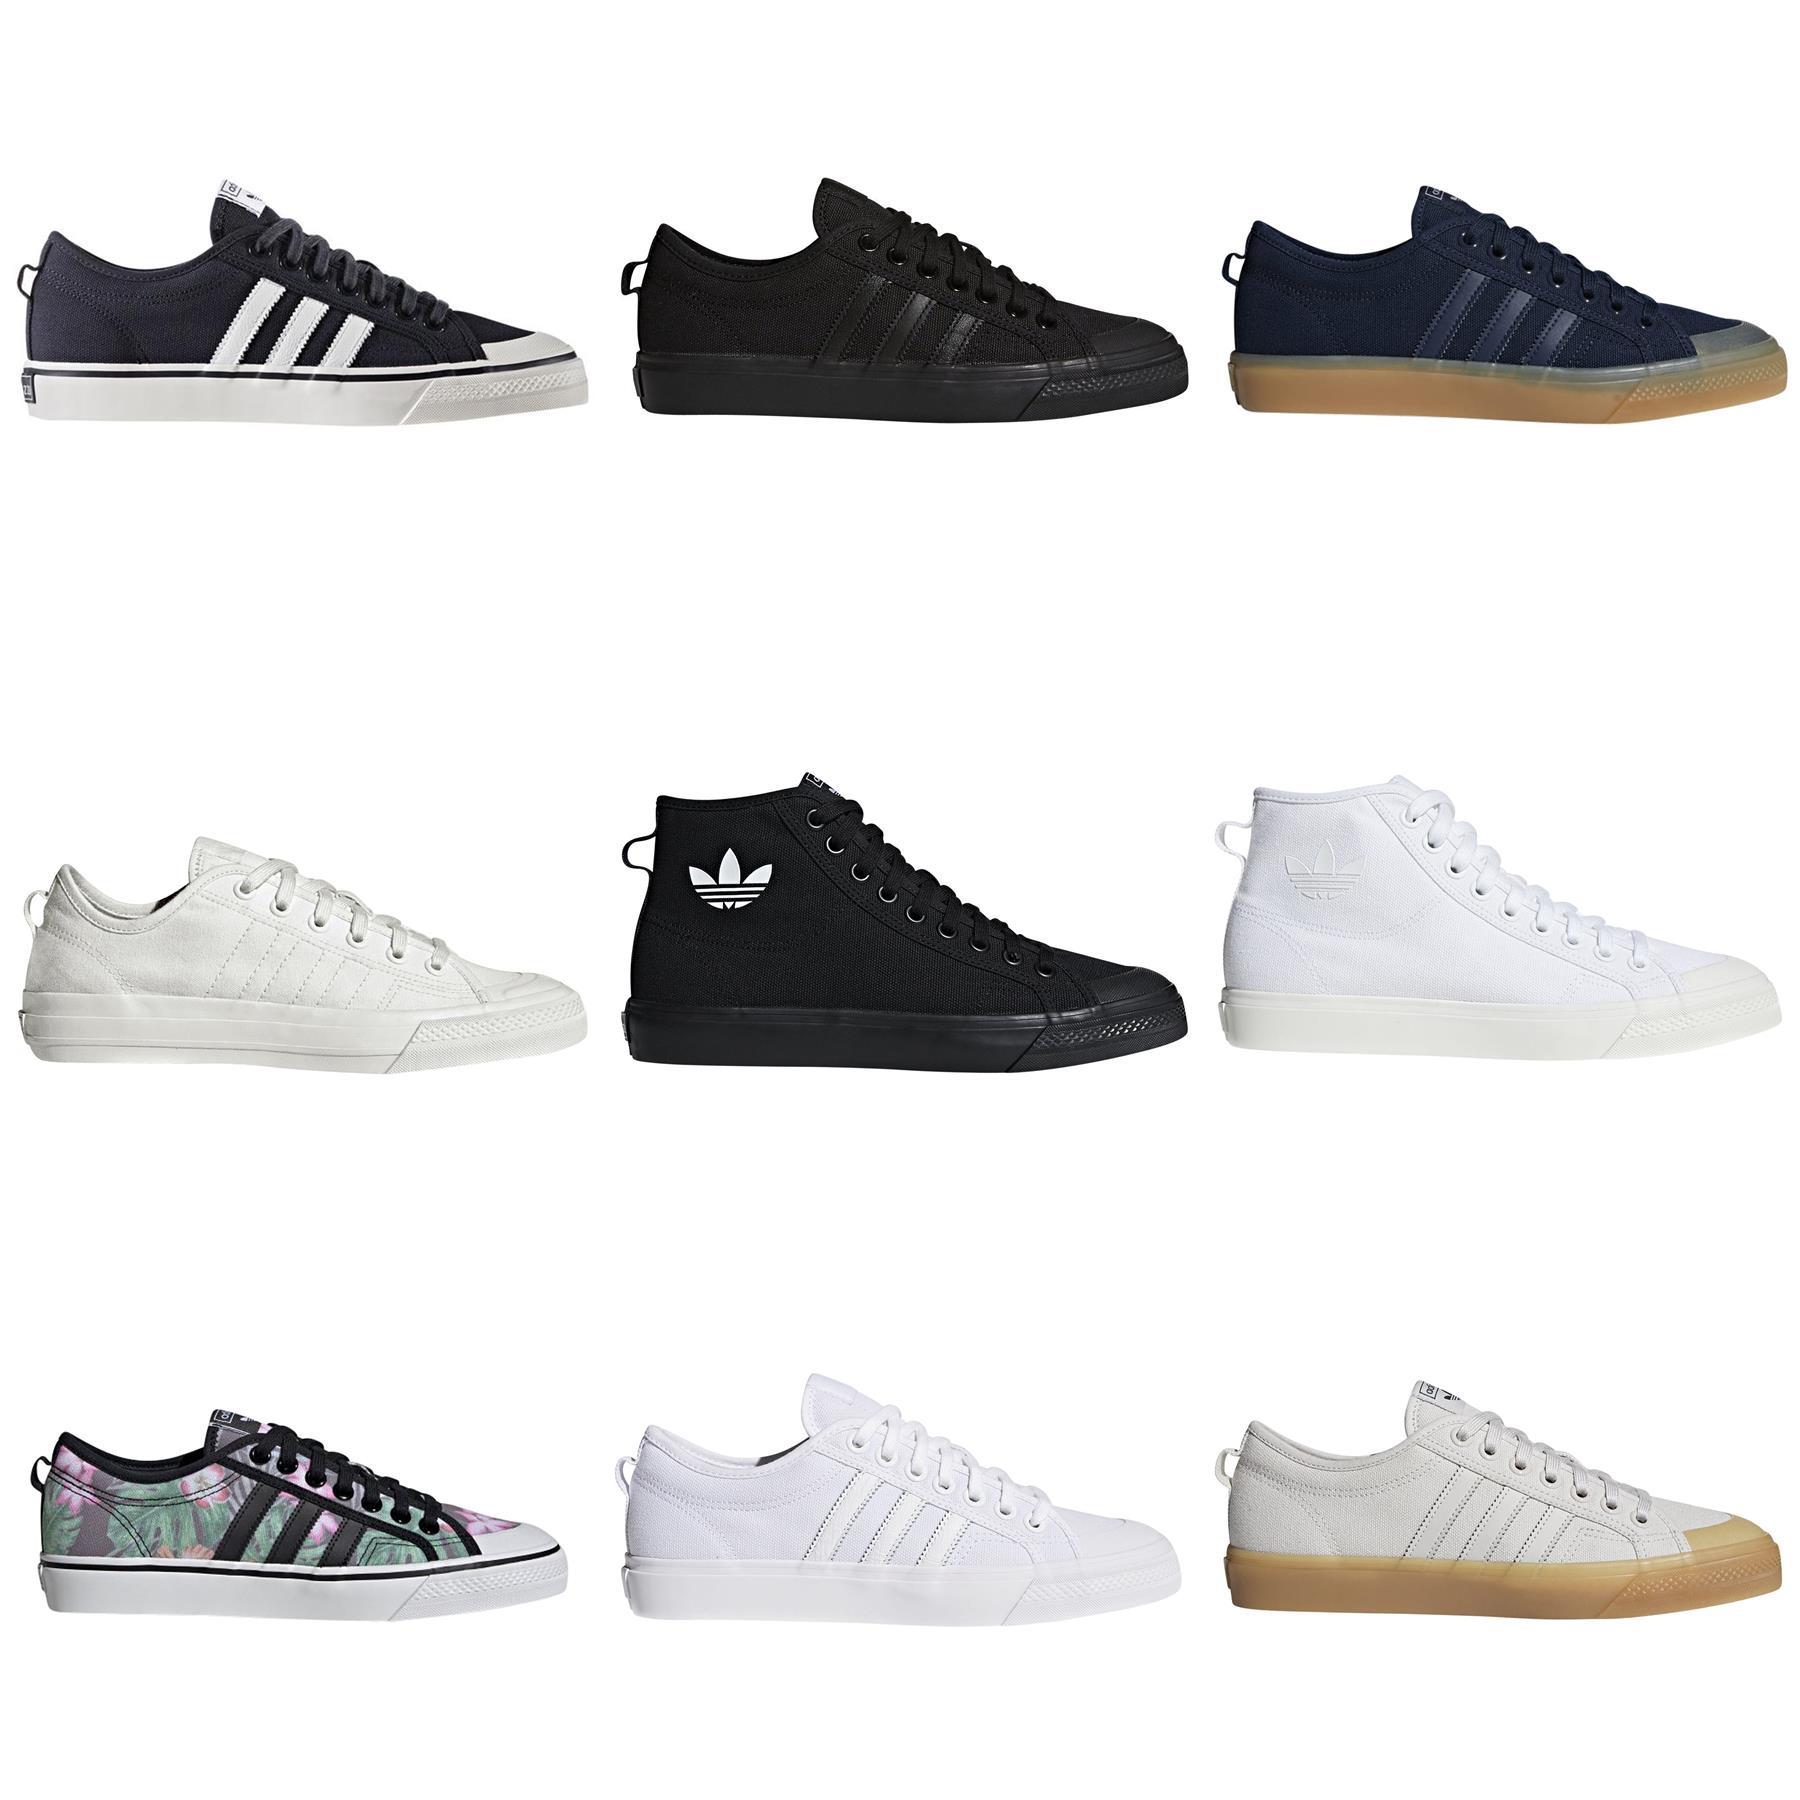 adidas ORIGINALS NIZZA LO HI RF TRAINERS SKATEBOARDING SHOES ...